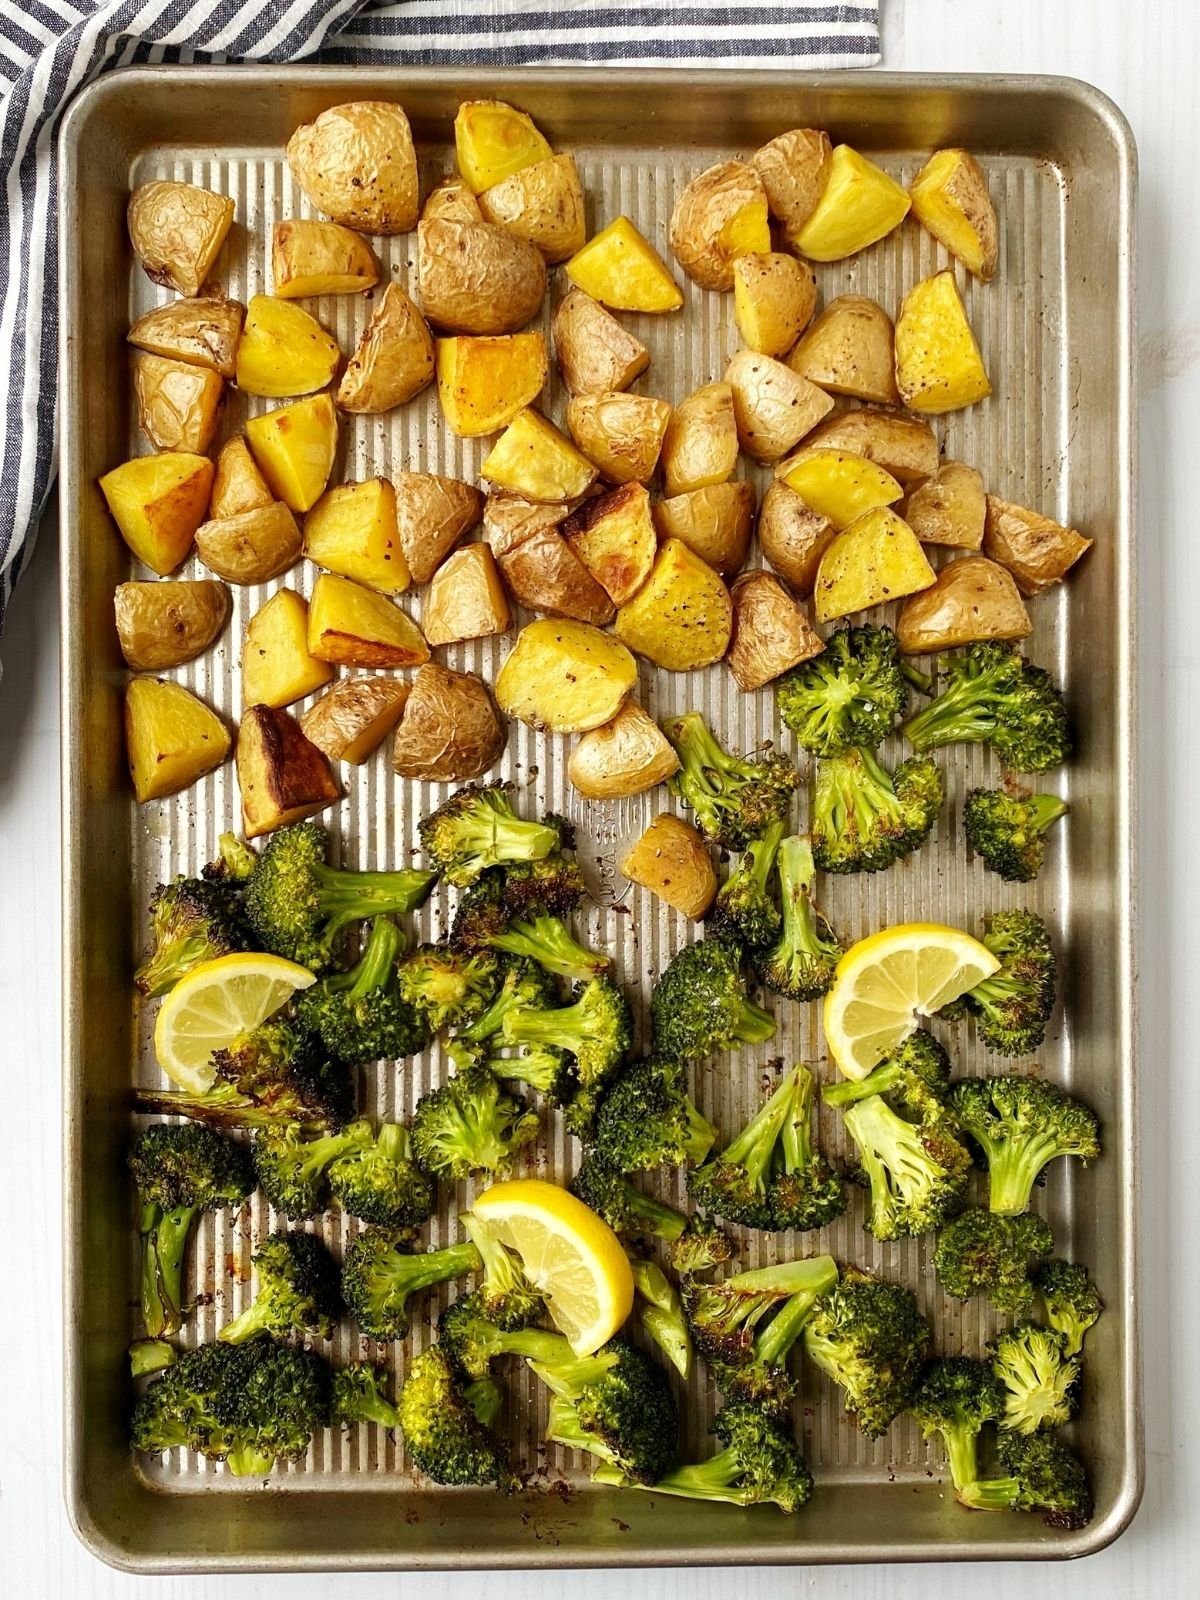 pan of roasted veggies